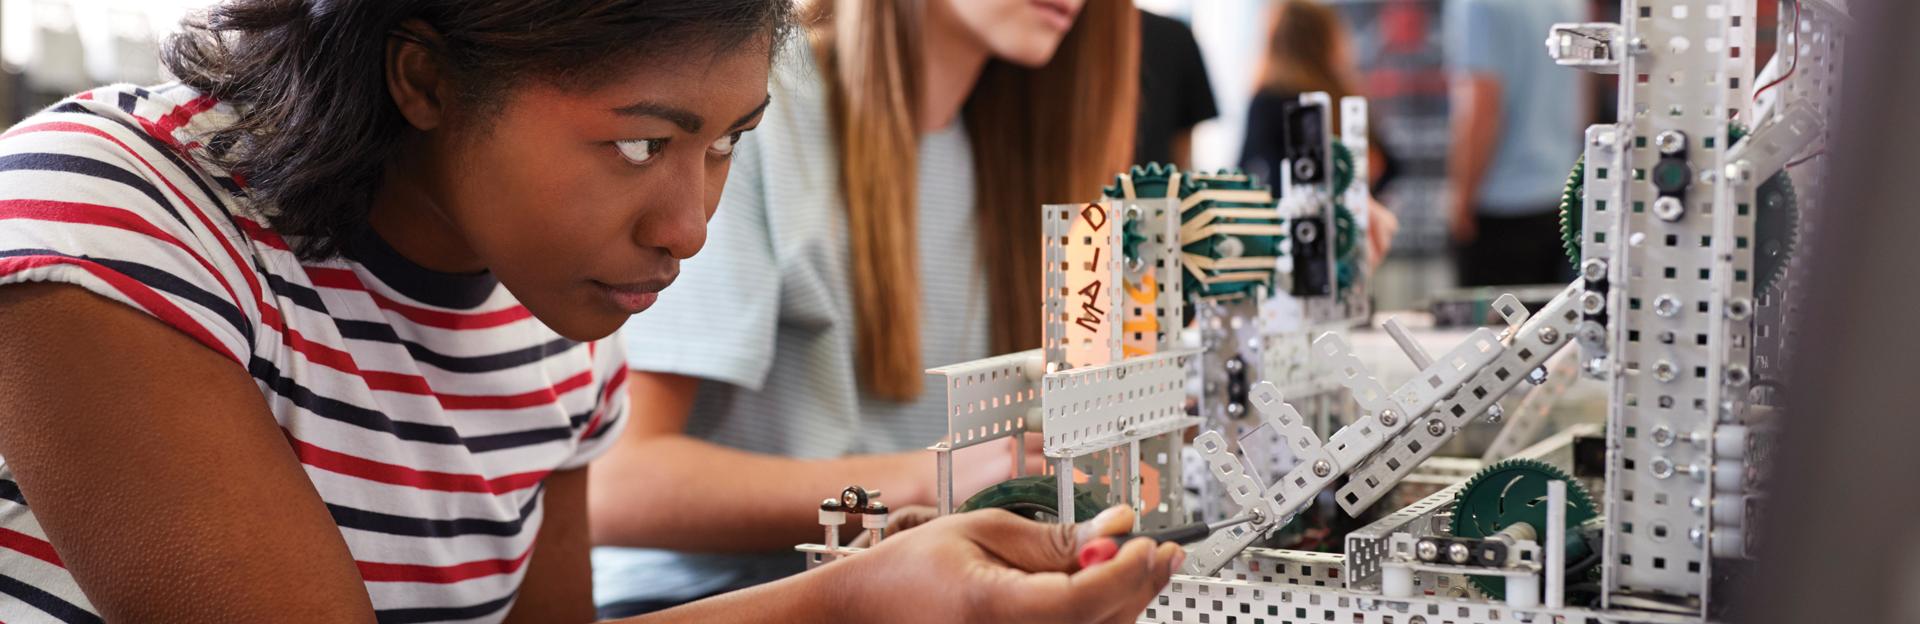 Montclair State University: Inspiring the Next Generation for STEM Innovators